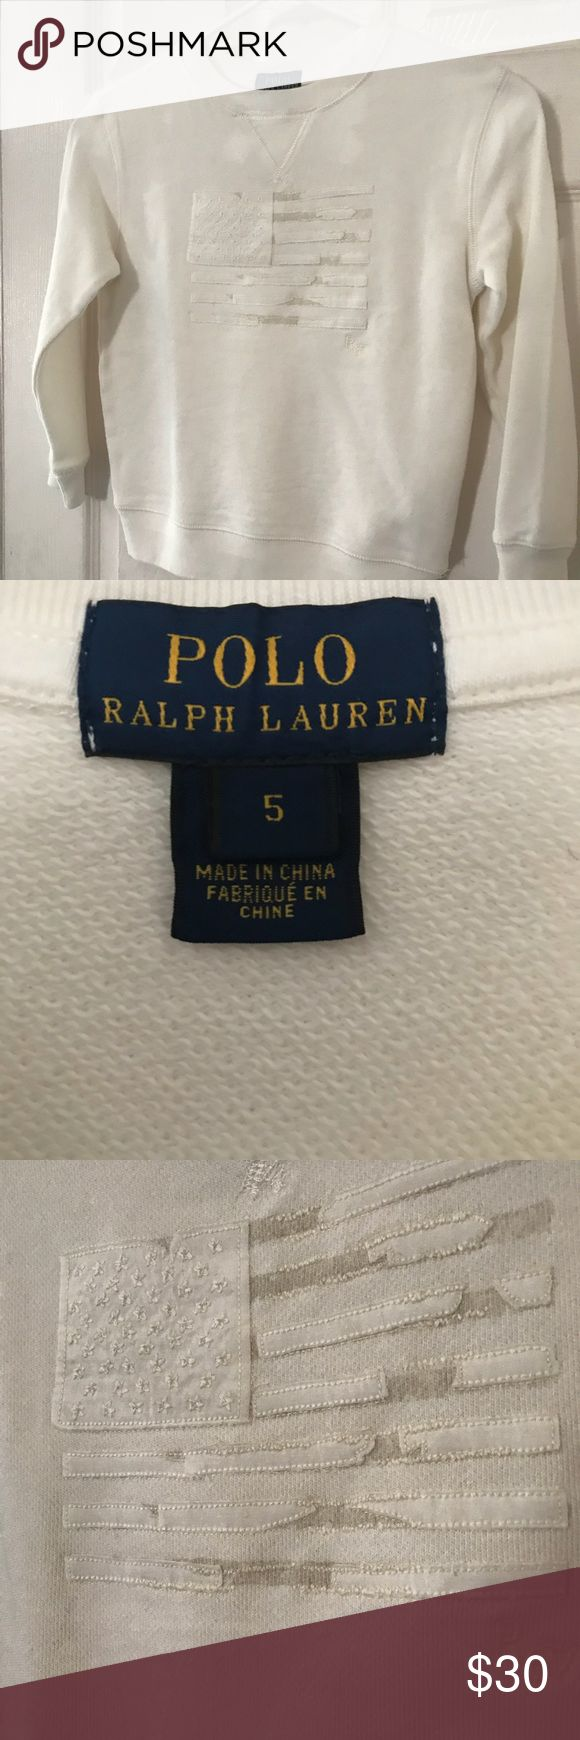 New Boy's Polo Ralph Lauren Sweatshirt Size: 5 New Boy's Polo Ralph Lauren Sweatshirt Size: 5. Orig. $49 Polo by Ralph Lauren Shirts & Tops Sweatshirts & Hoodies